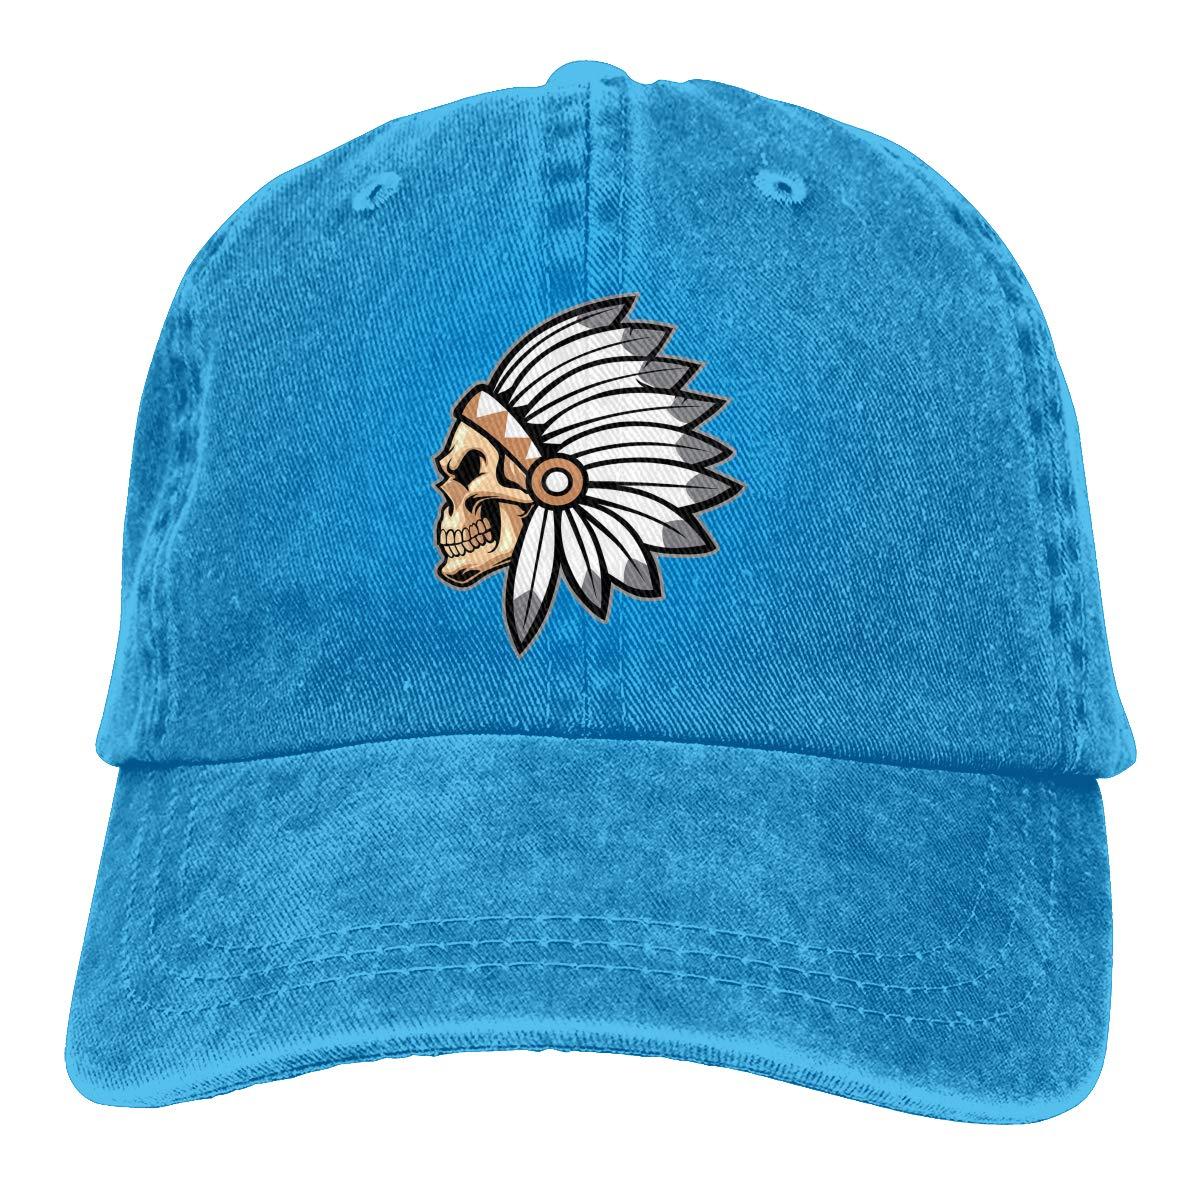 Native American Chief Fashion Adjustable Cowboy Cap Baseball Cap for Women and Men